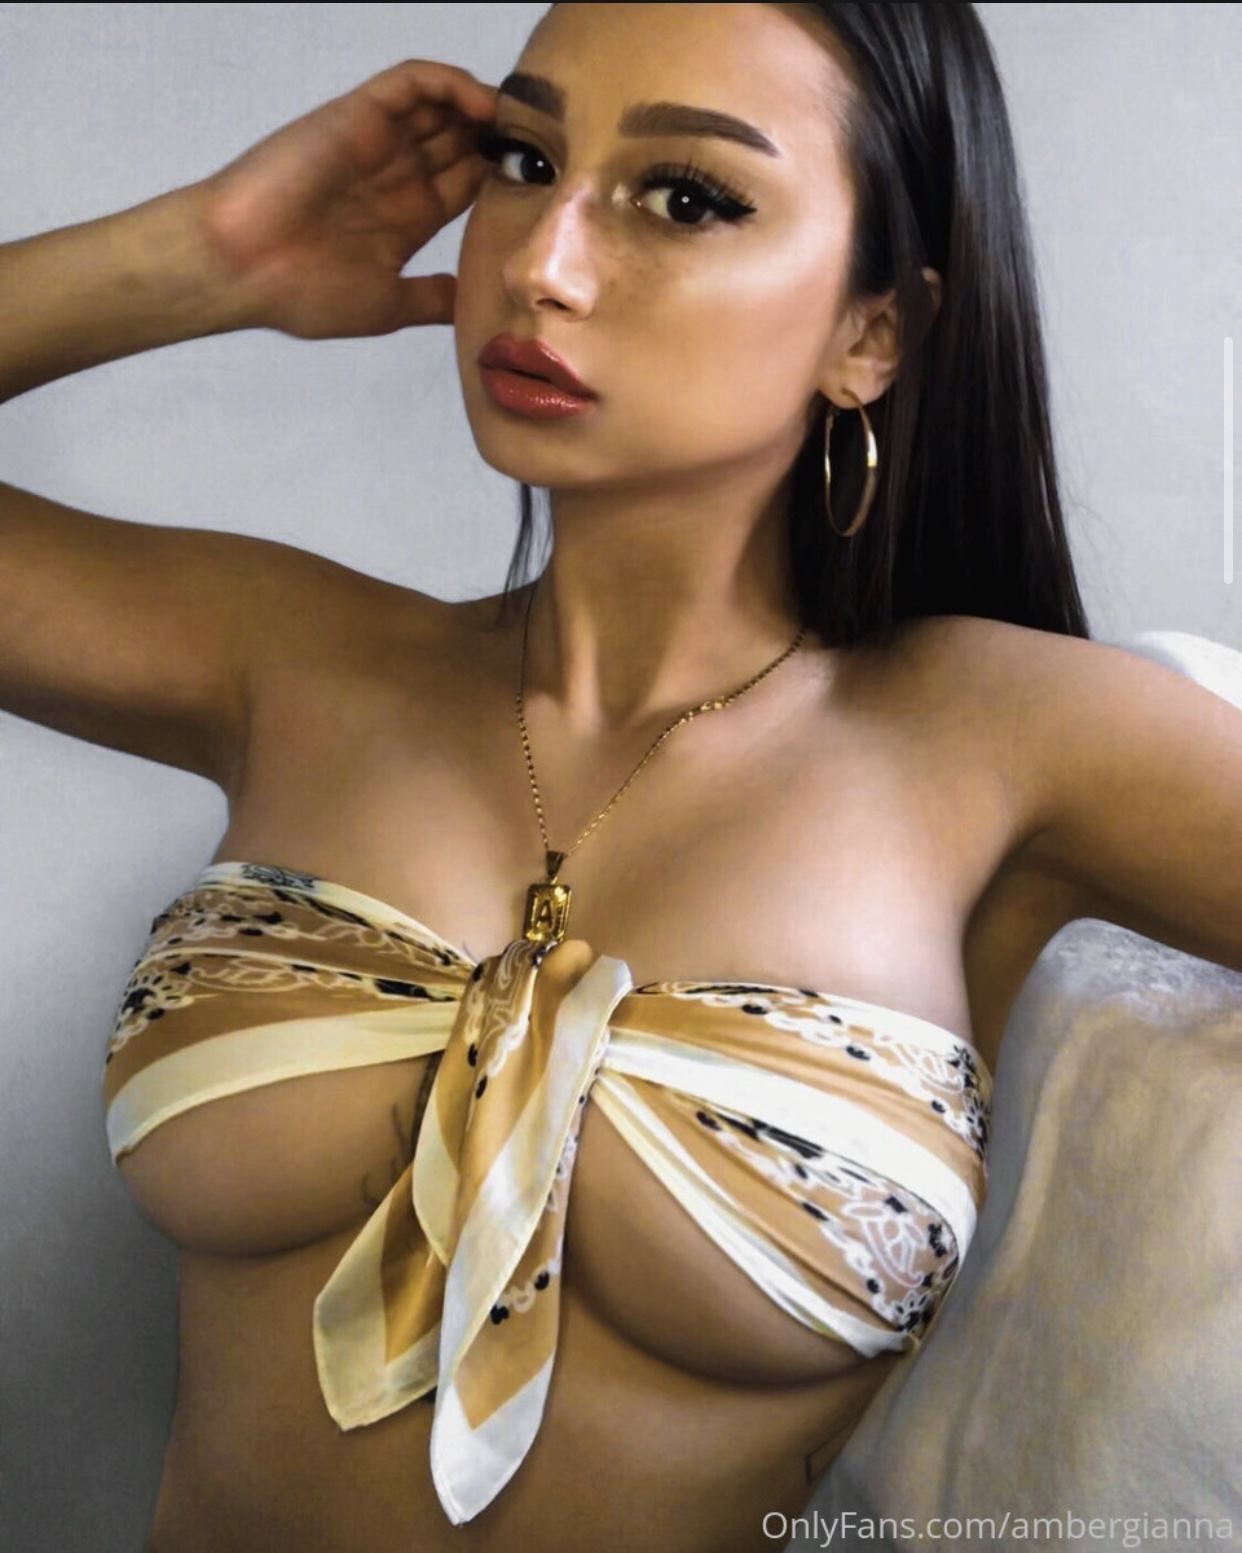 Amber Gianna Leaked 0005